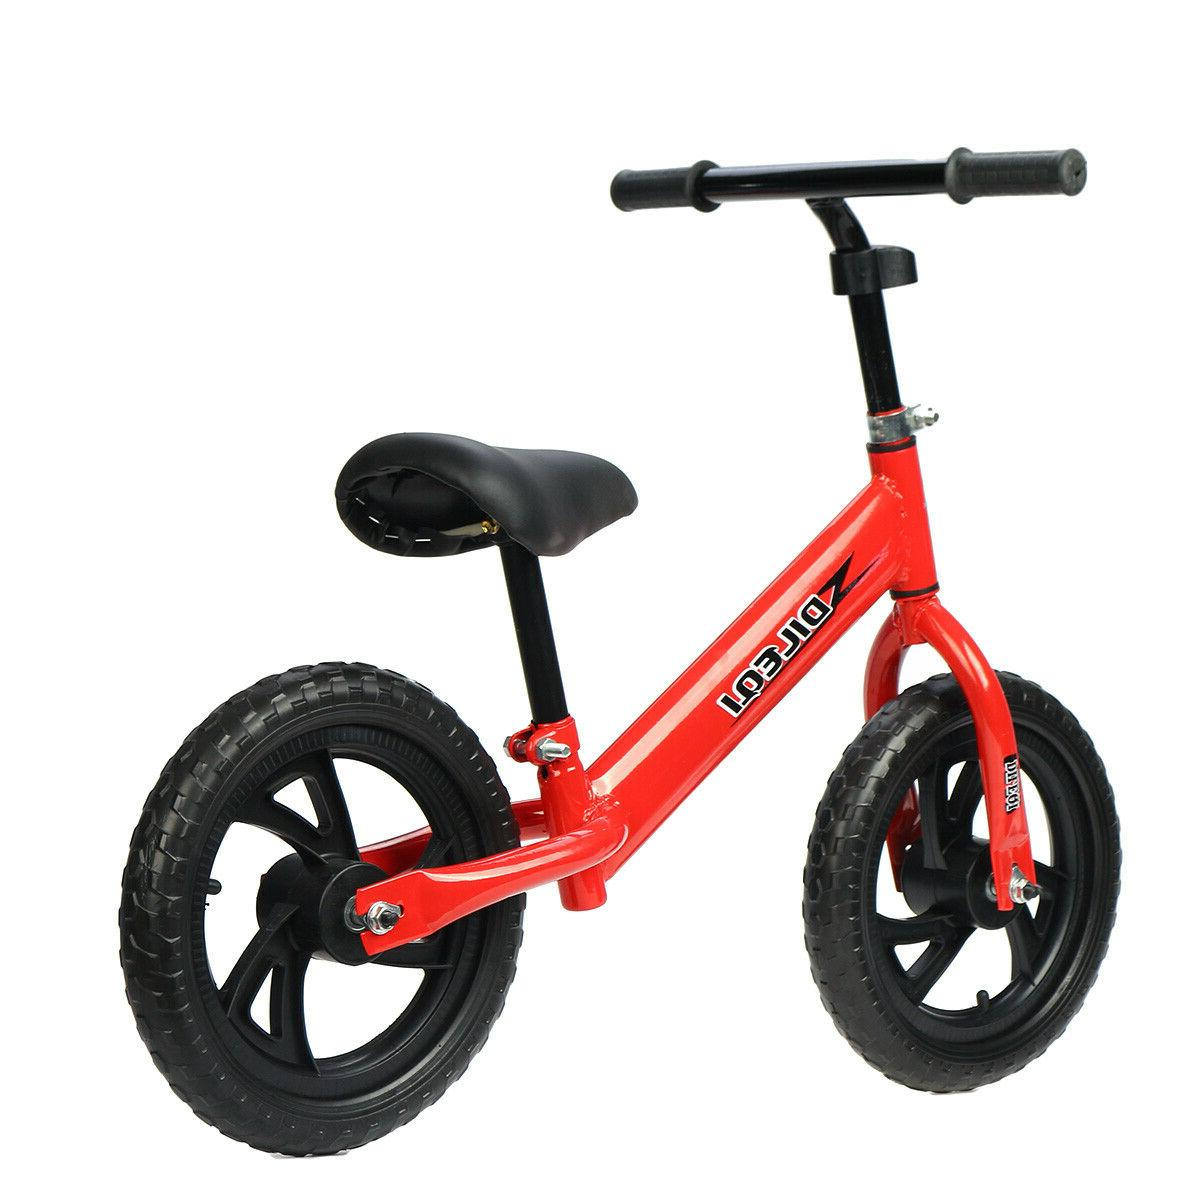 Kids No Pedal Bicycle Toy Seat